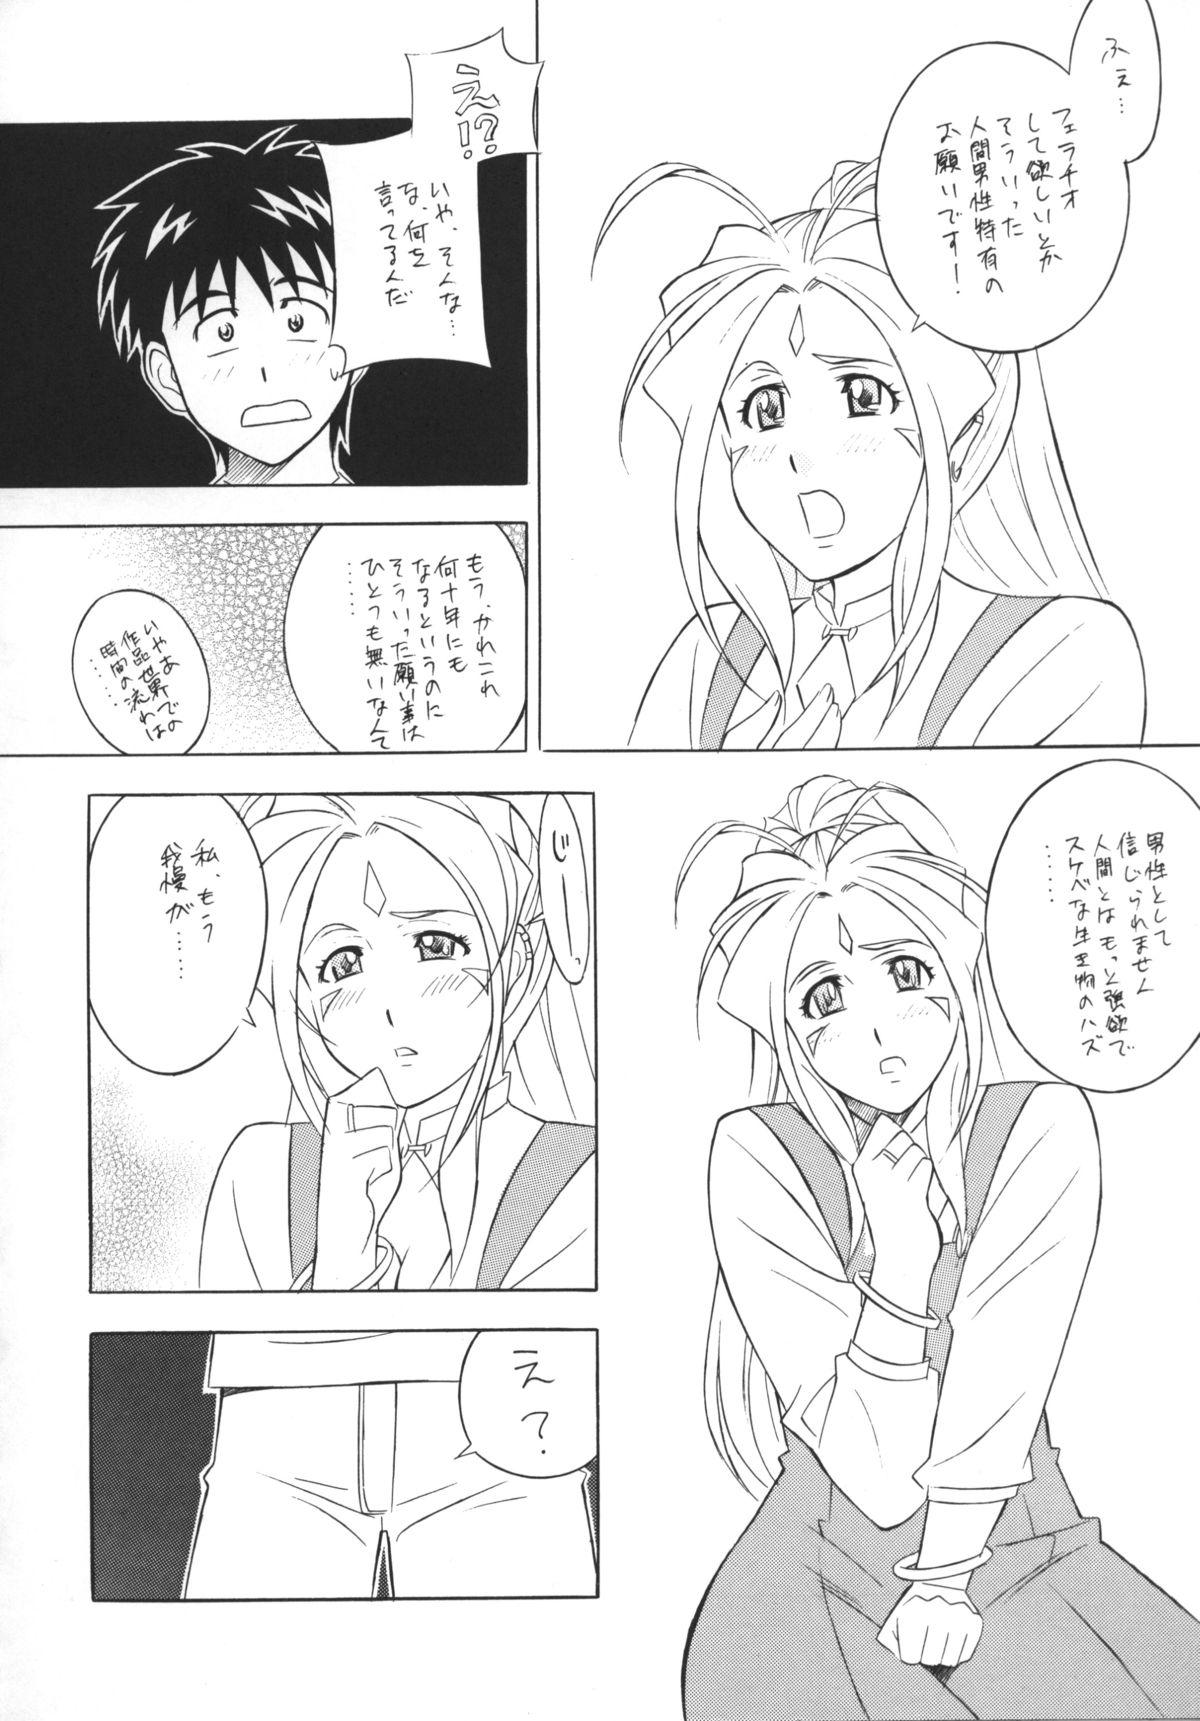 [Okachimentaiko (H-H, Minazuki Akira) Oh! Hentai (Various) 4